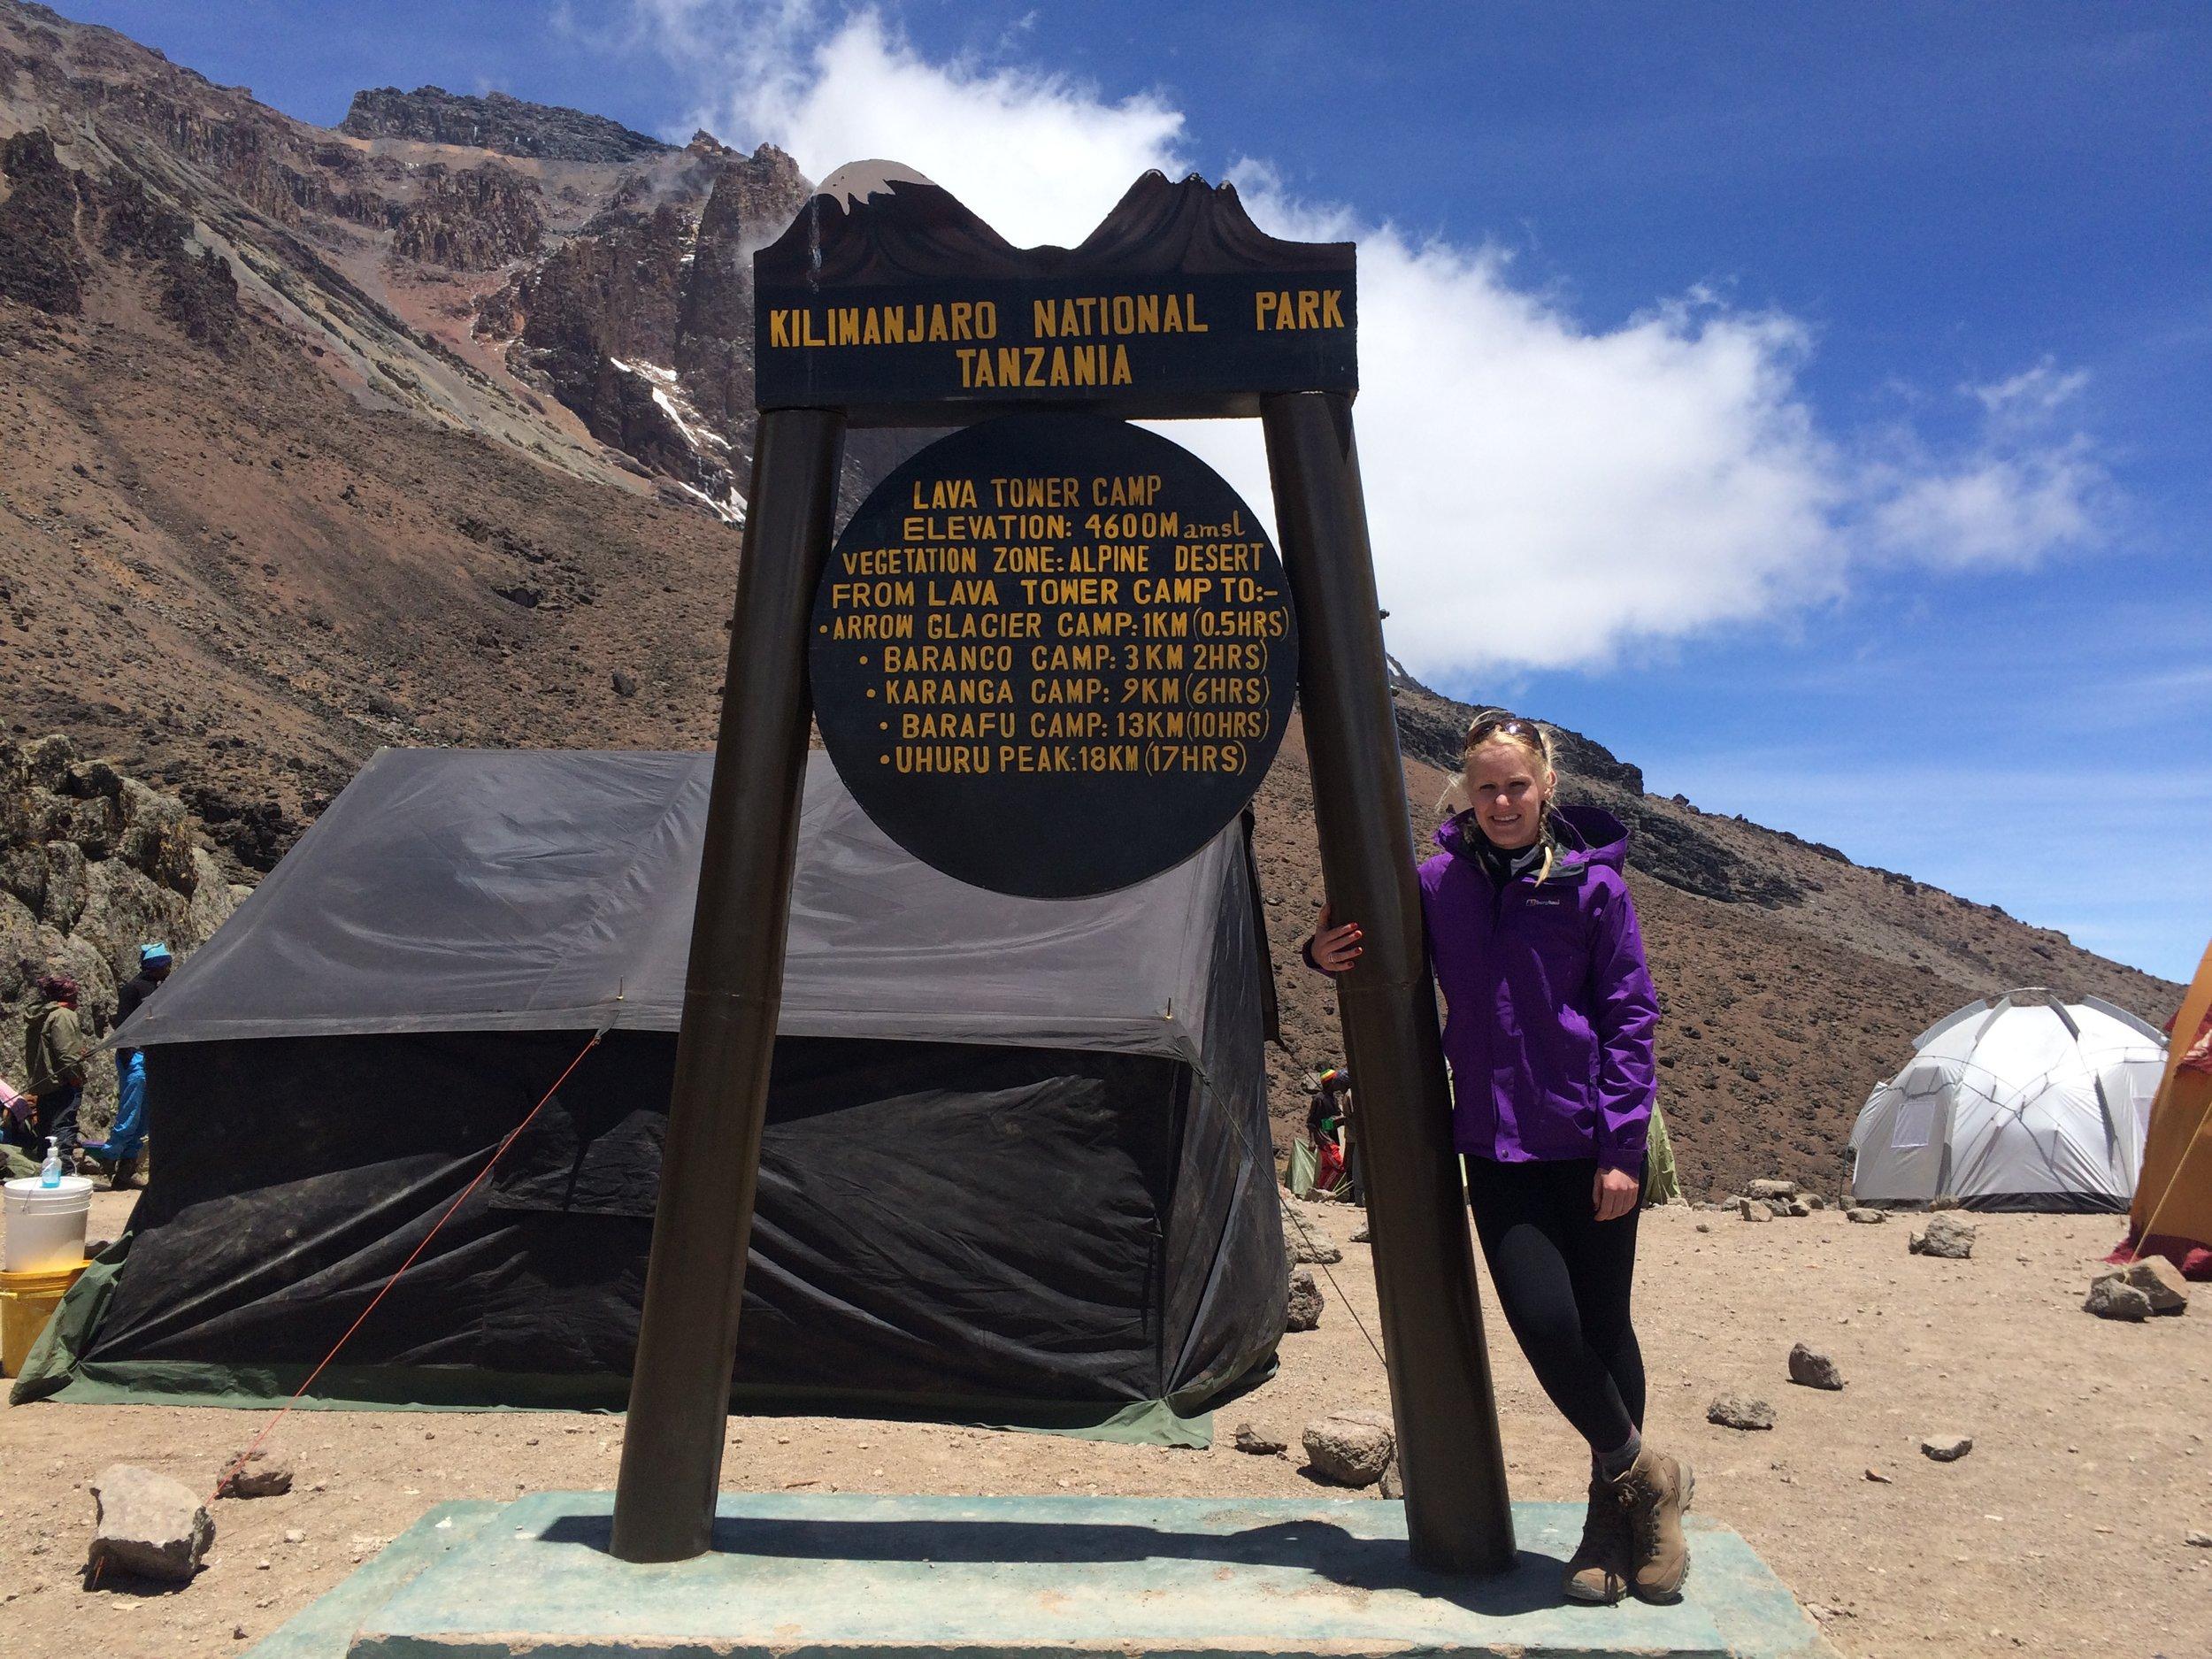 Lava Tower, Mount Kilimanjaro, 4600 metres